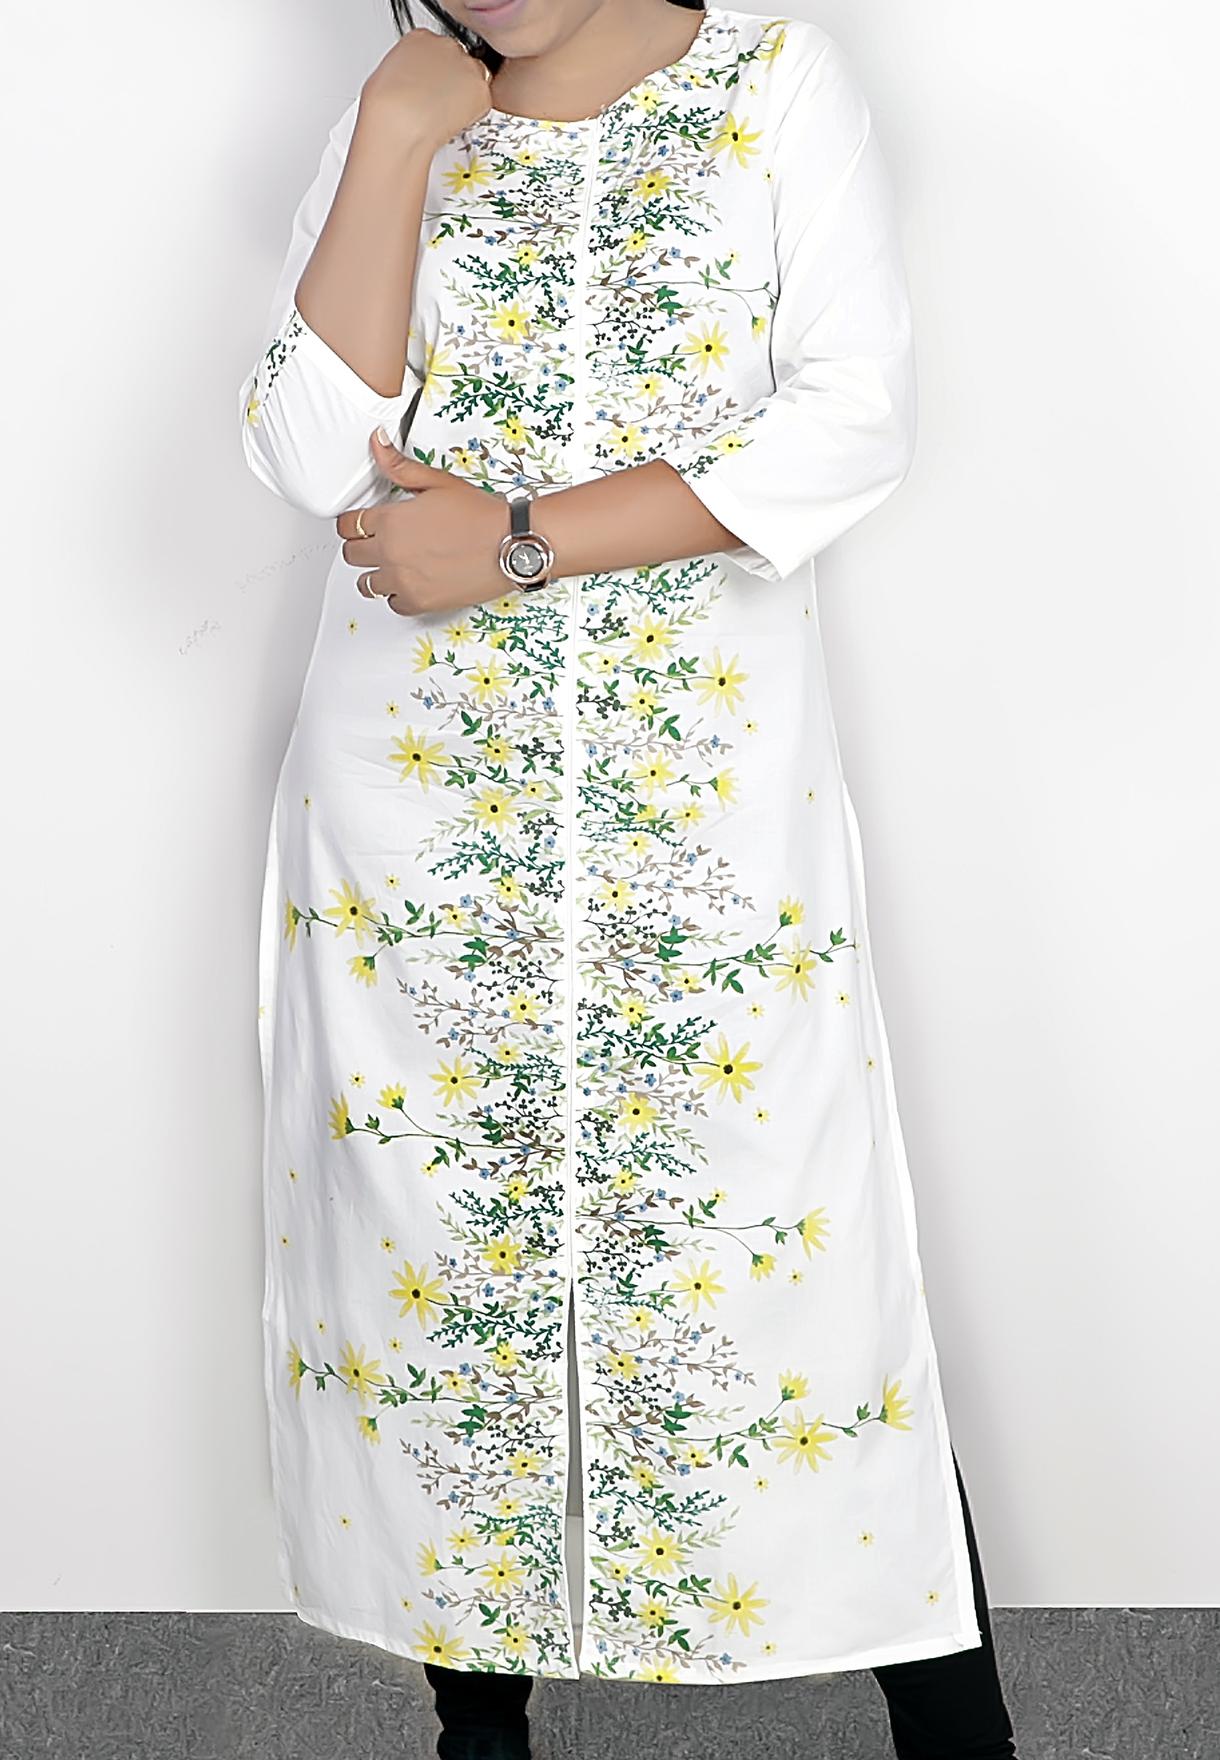 Ruky Fareen Long Top Full Sleeve Kurthees Cotton Yellow Flower - RF 108 - M